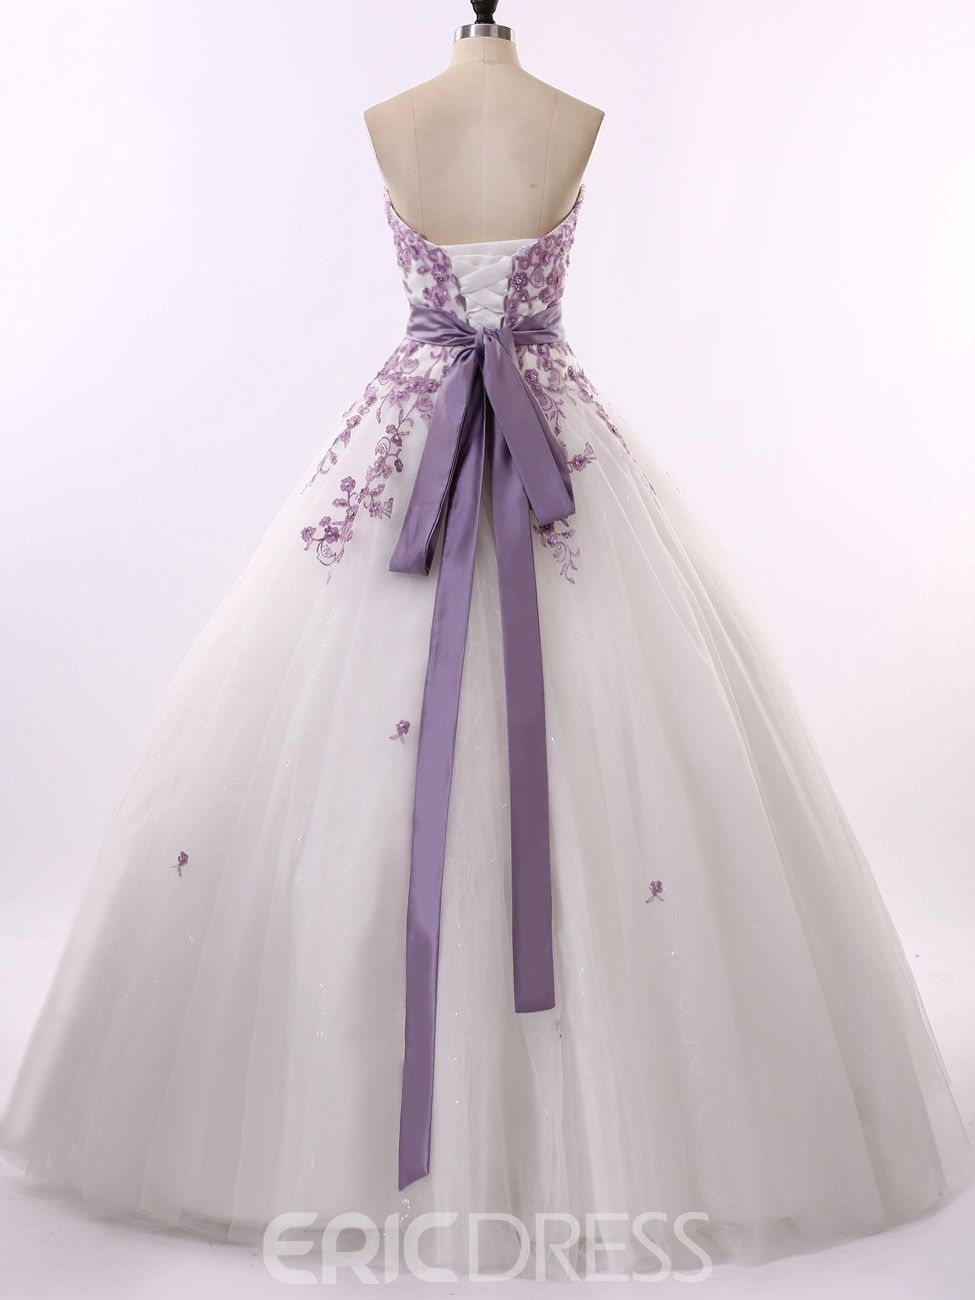 Strapless Appliques Ball Gown Wedding Dress  Lila kleid hochzeit